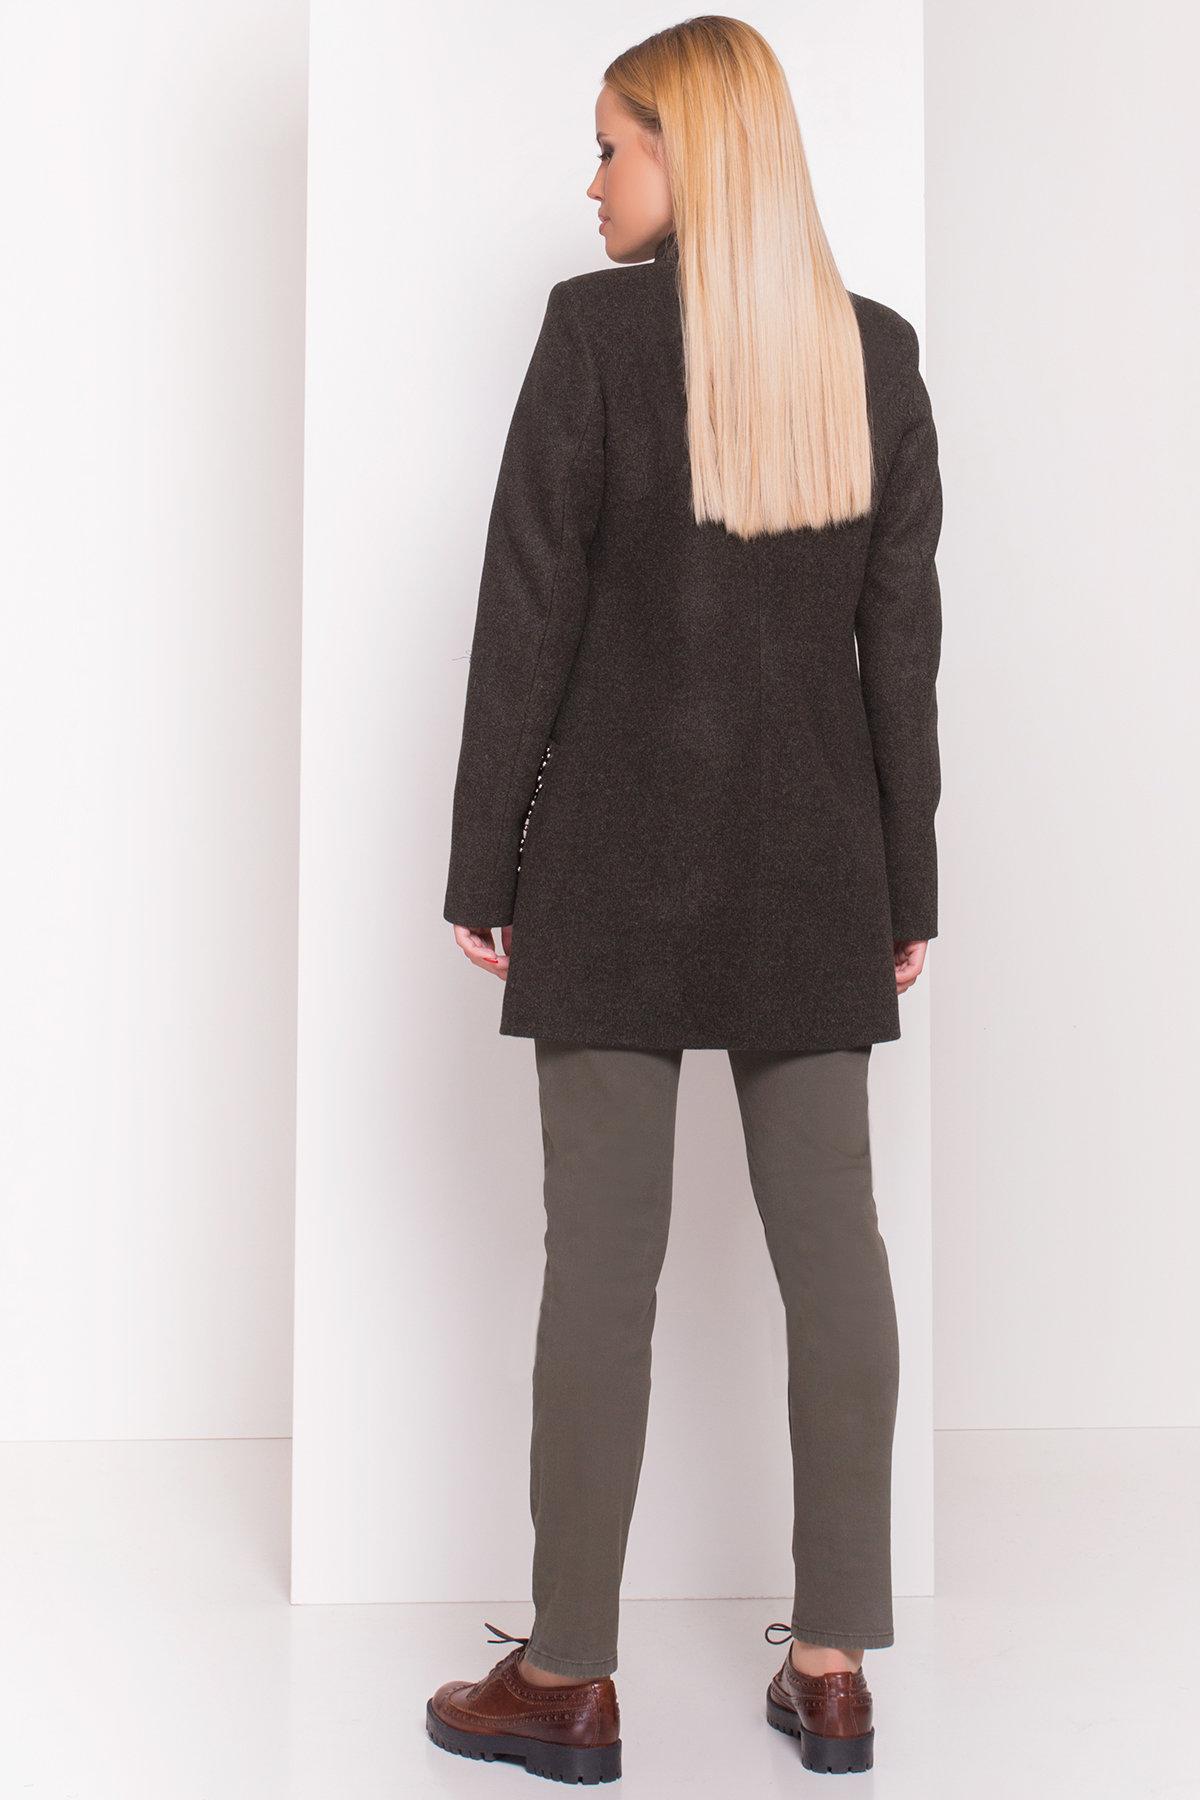 Пальто Даймон 5377 АРТ. 36746 Цвет: Хаки - фото 4, интернет магазин tm-modus.ru